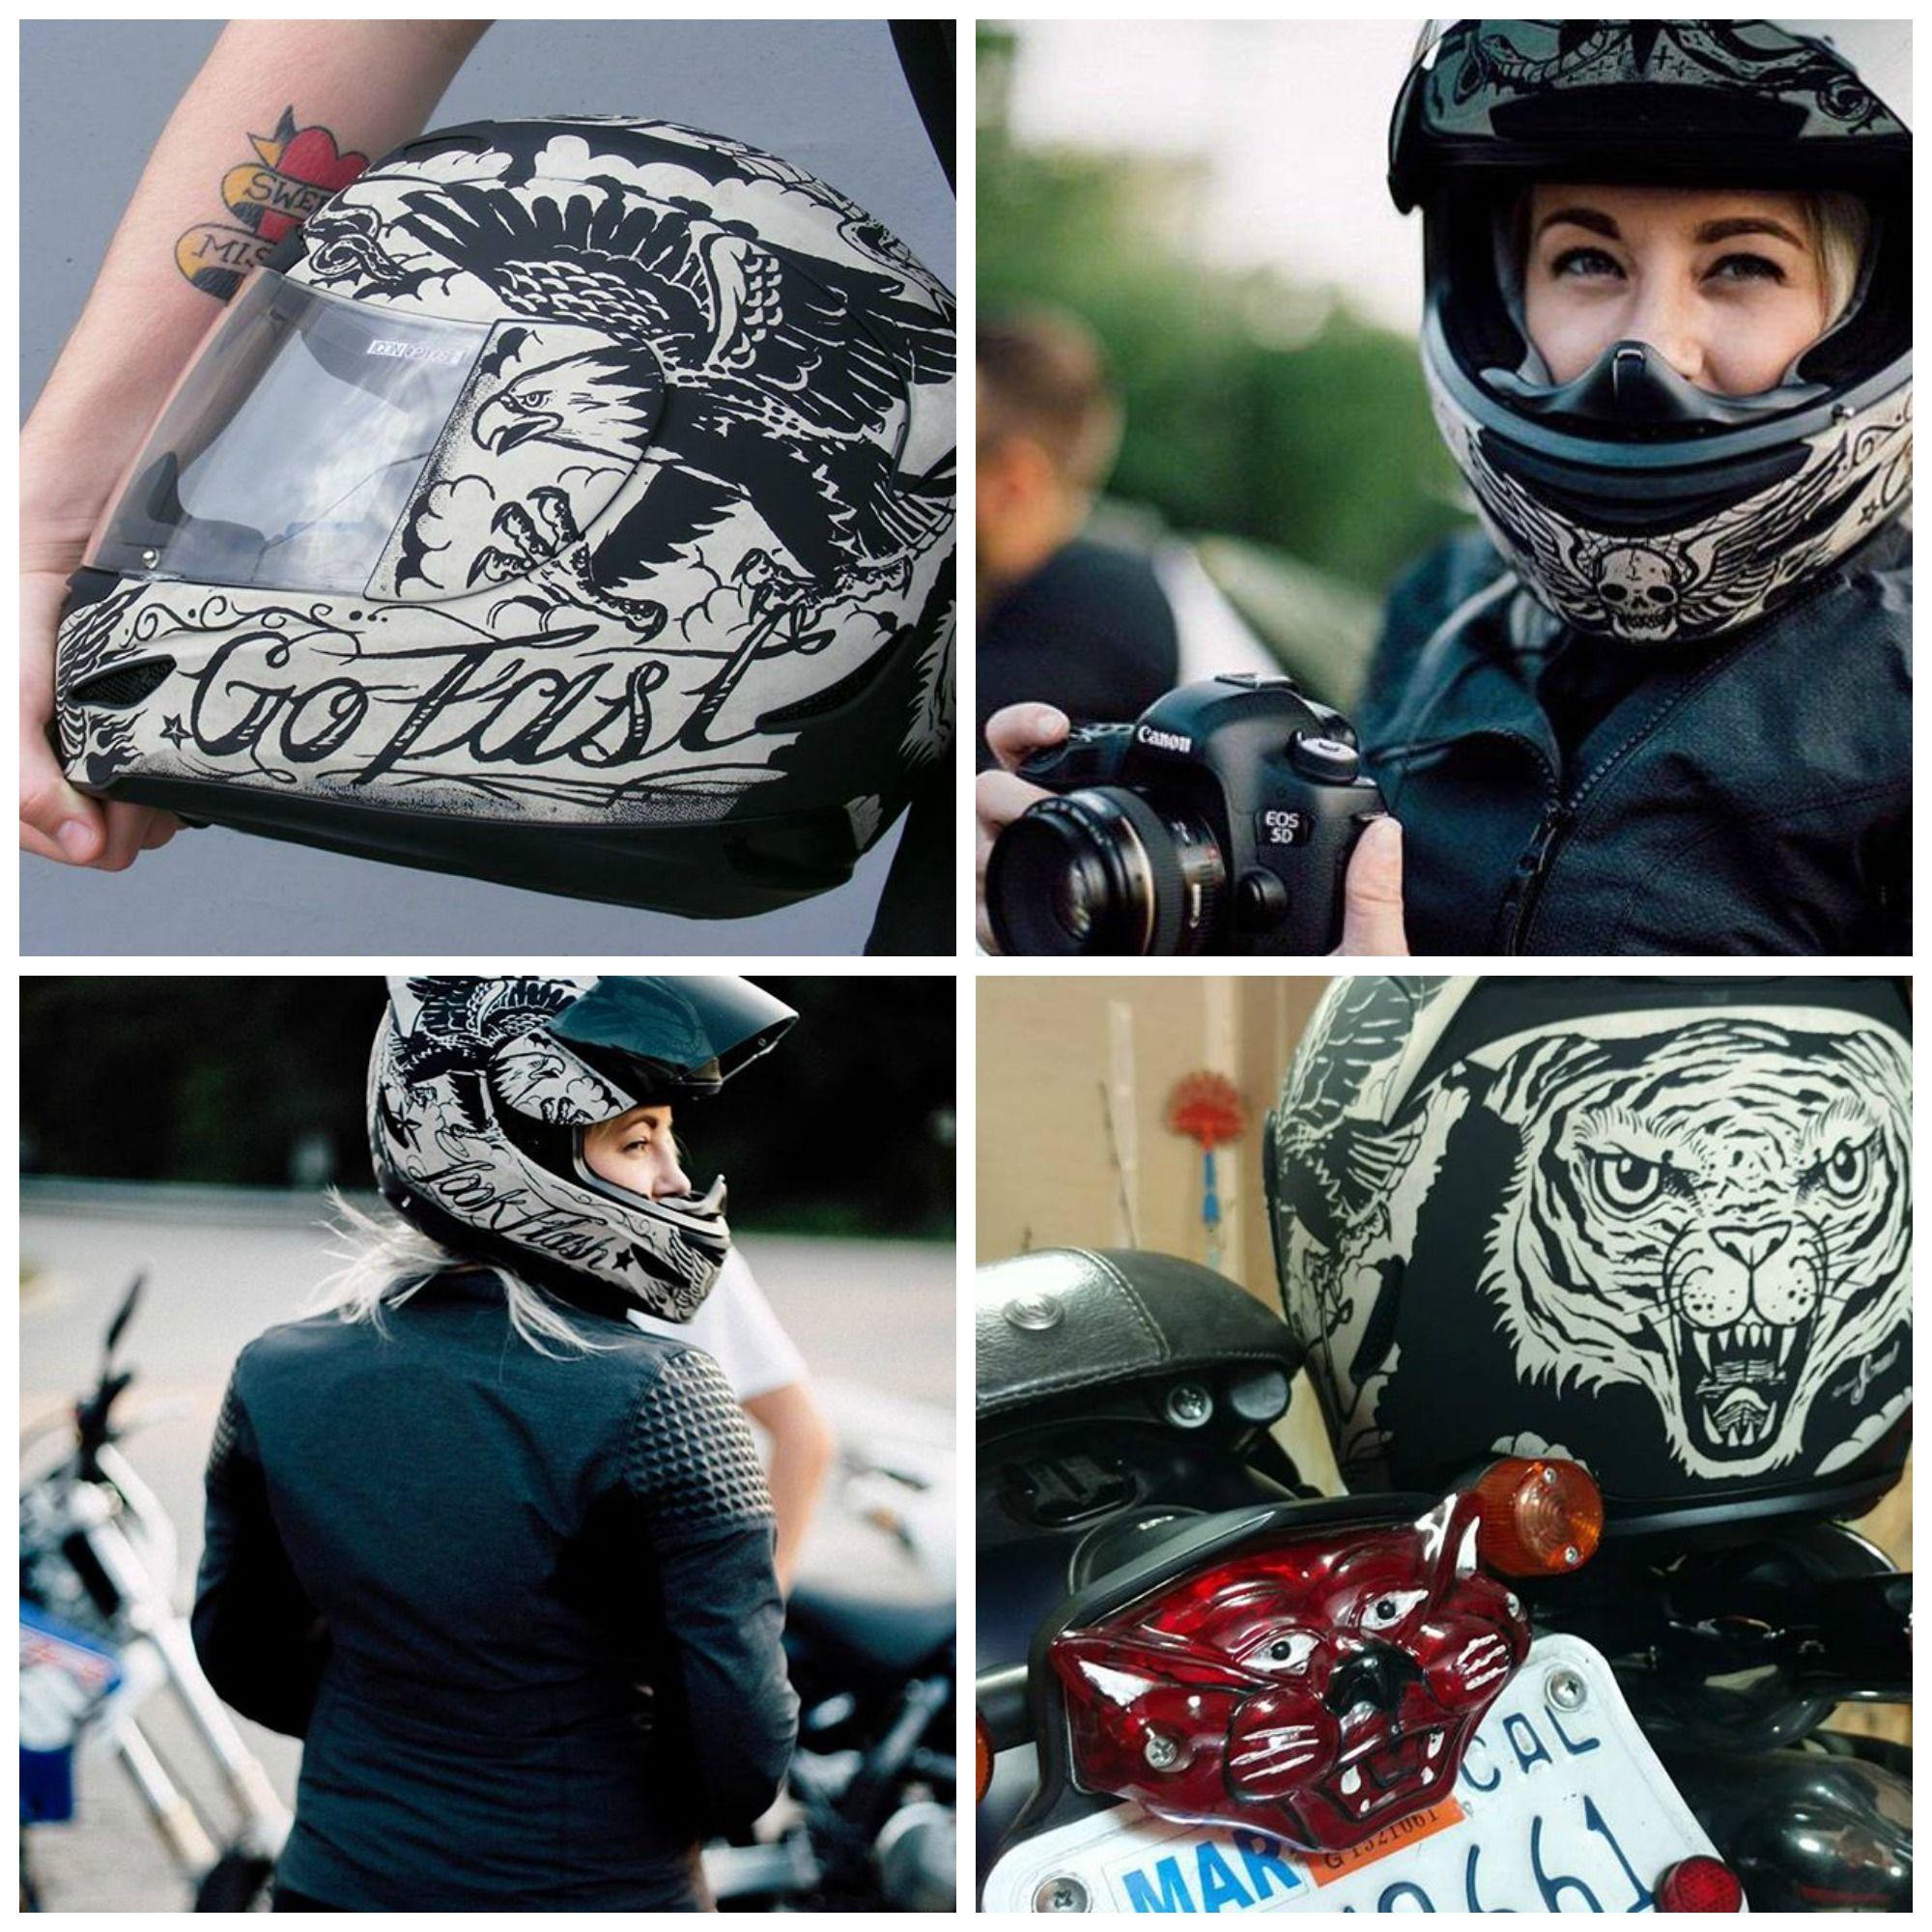 ICON Airmada Scrawl Helmet Review Helmet, Icon helmets